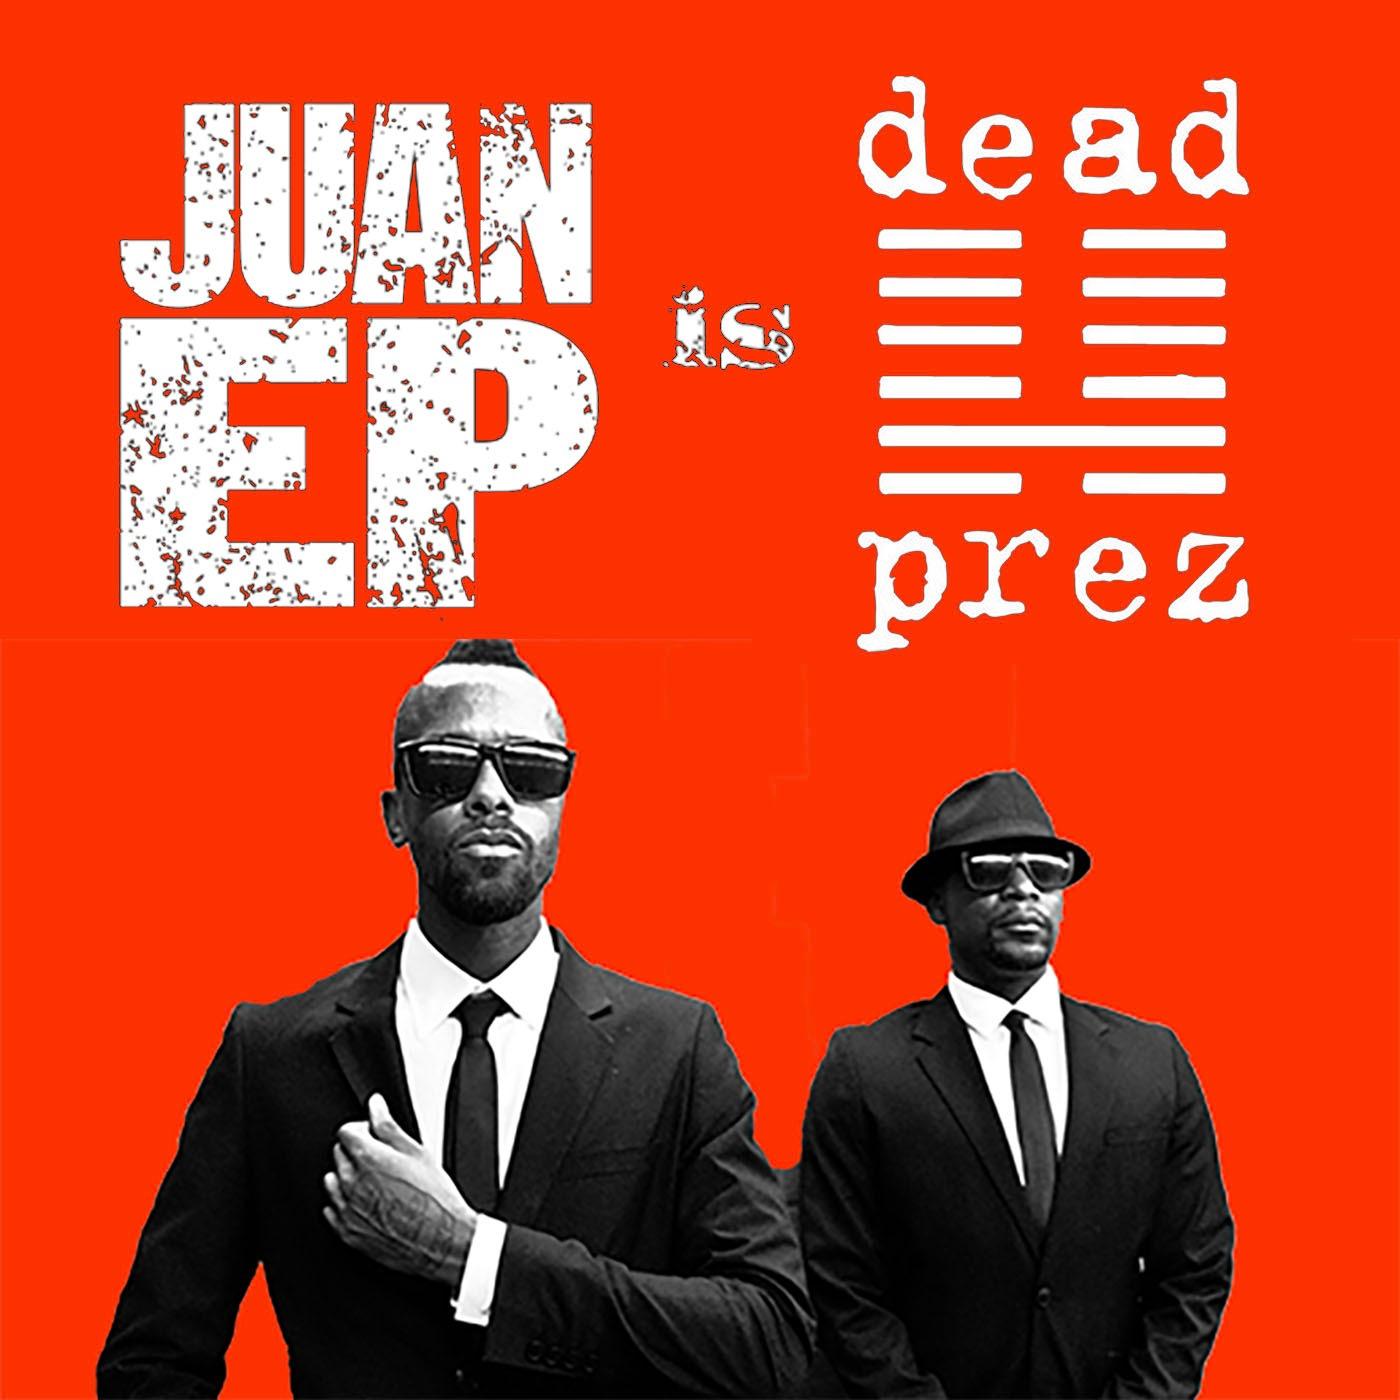 Juan Ep is Dead Prez